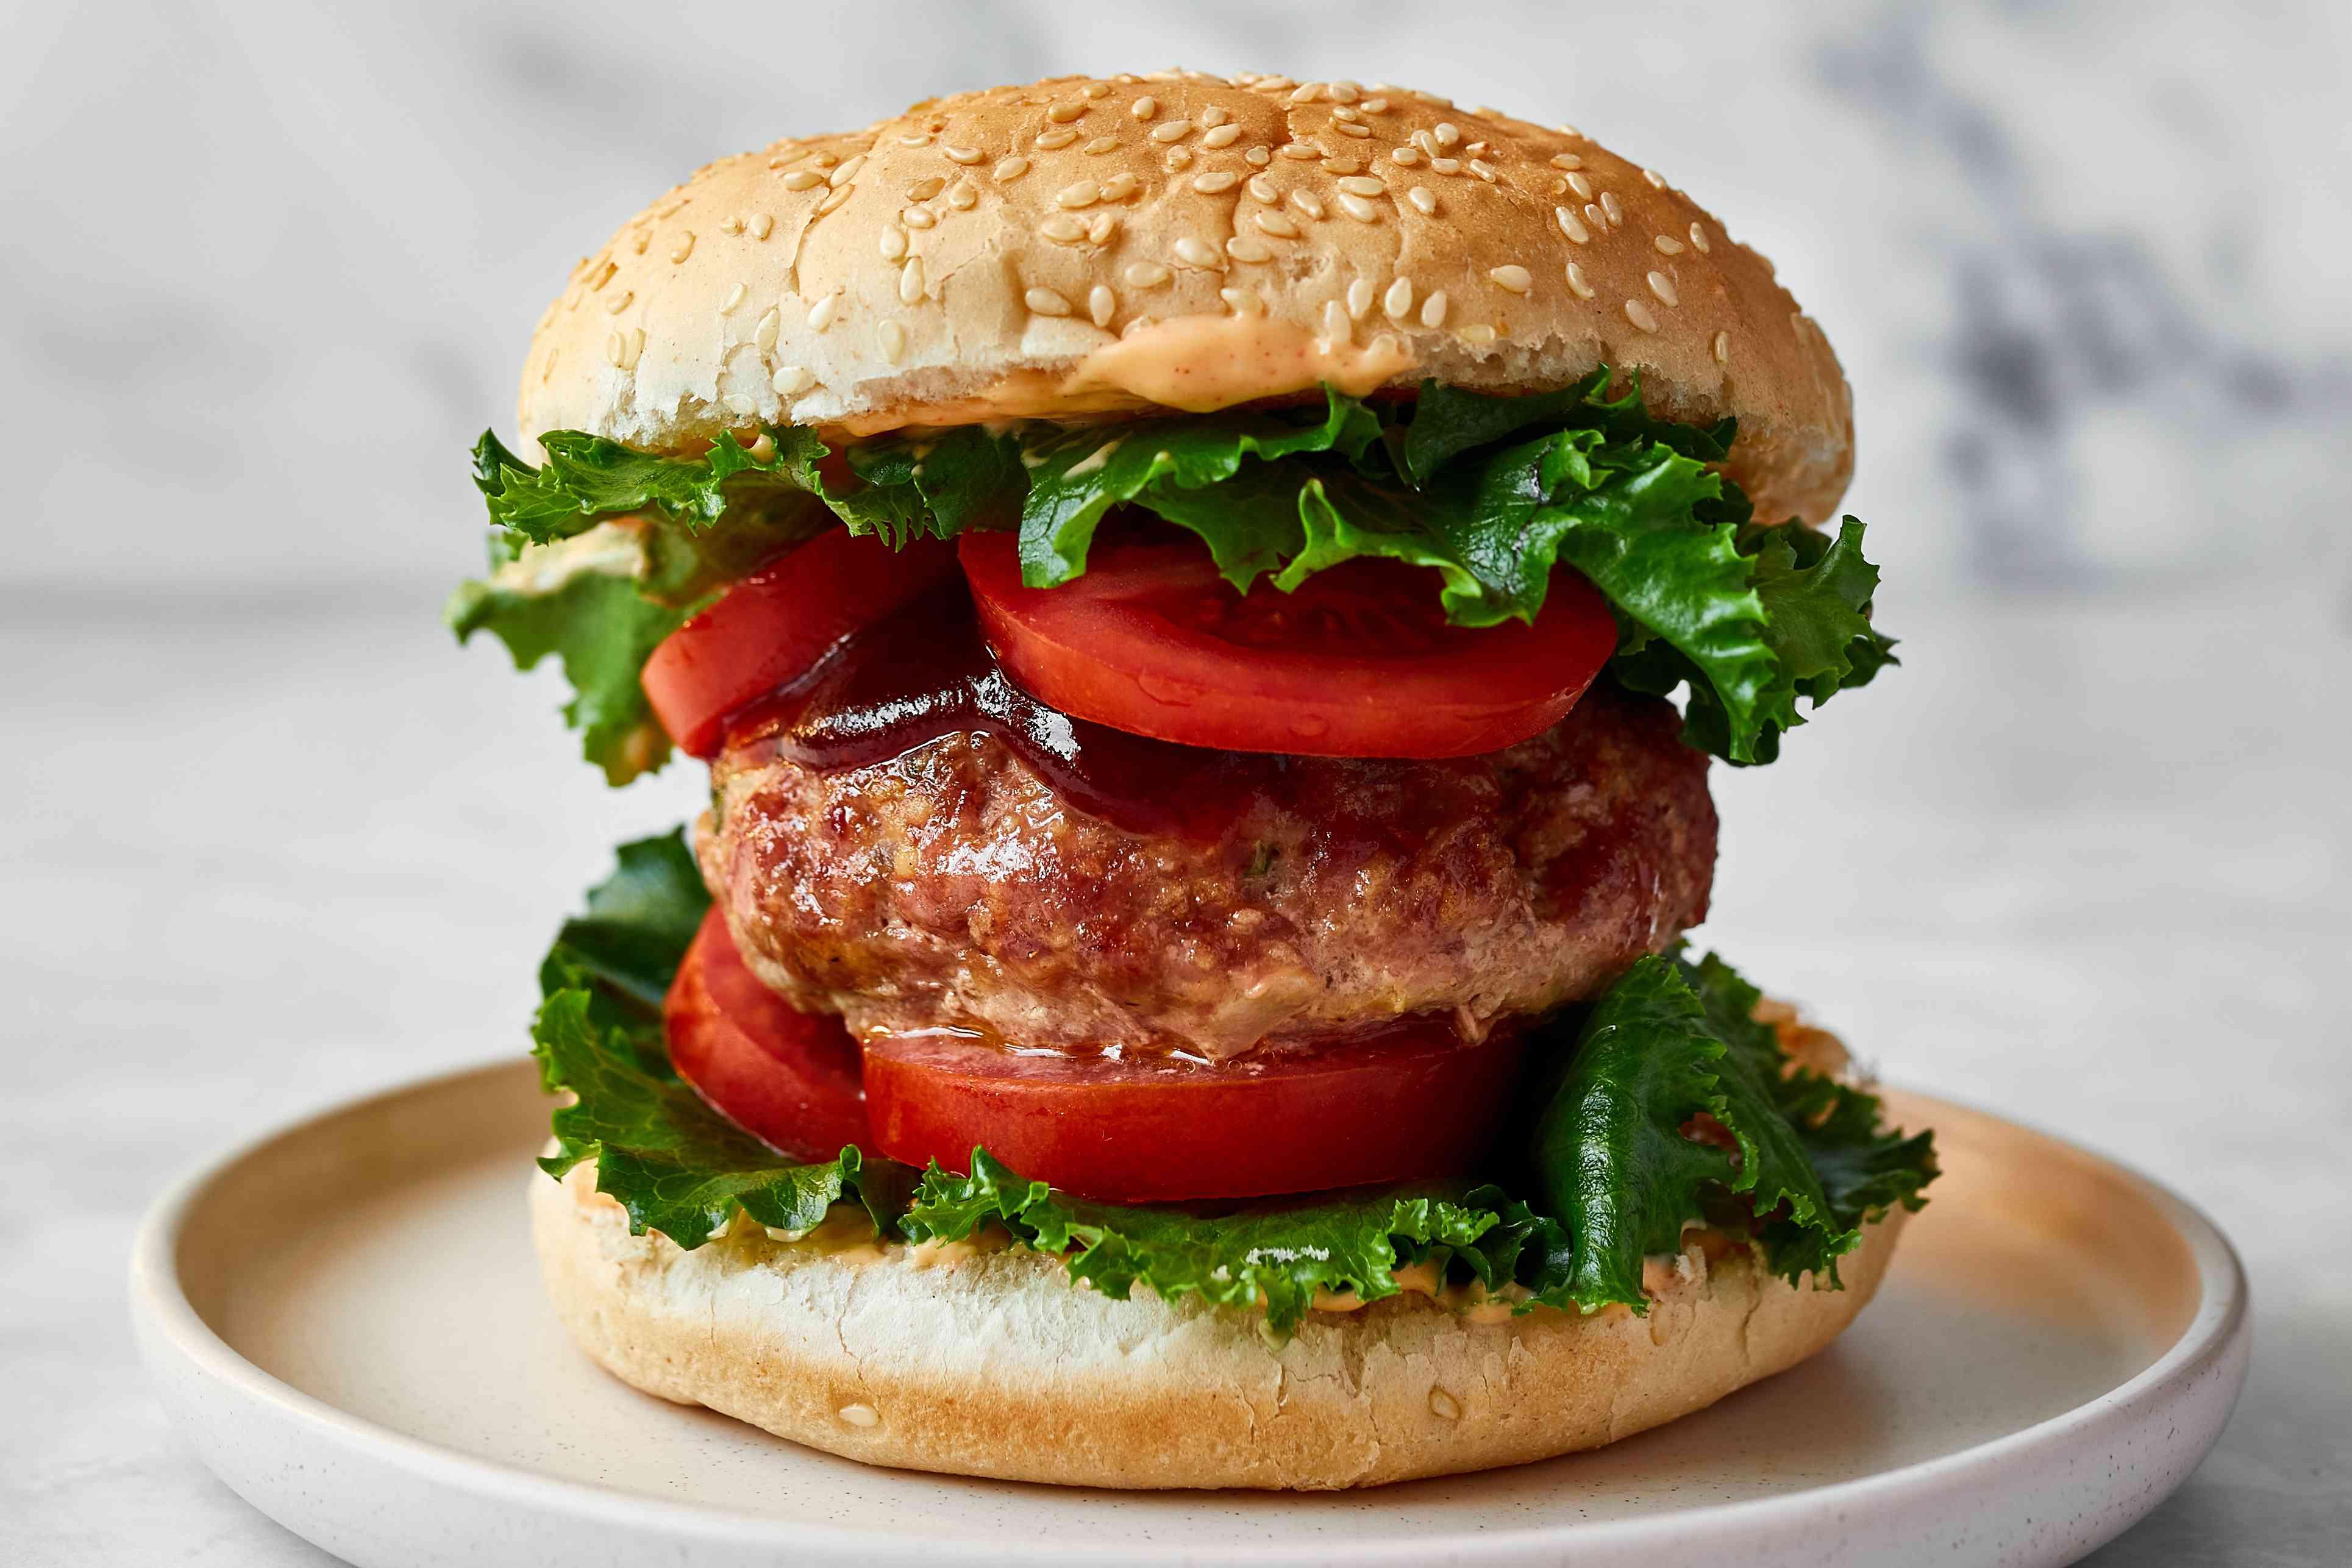 Juicy Baked Turkey Burgers With Garlic recipe